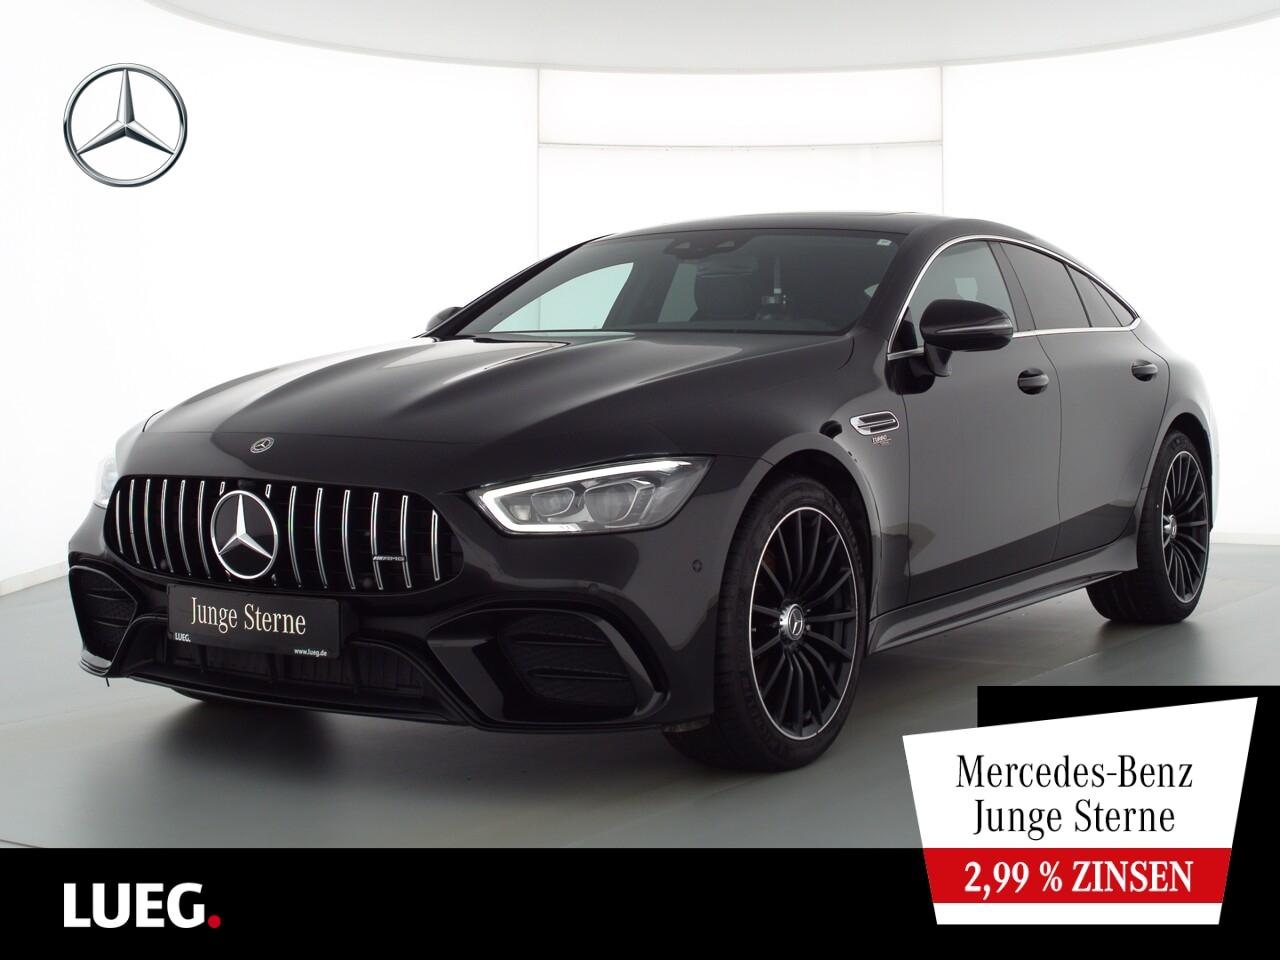 Mercedes-Benz AMG GT 43 4M+ Navi+SHD+Burm+Mbeam+Widesc+PfAbGas, Jahr 2019, Benzin